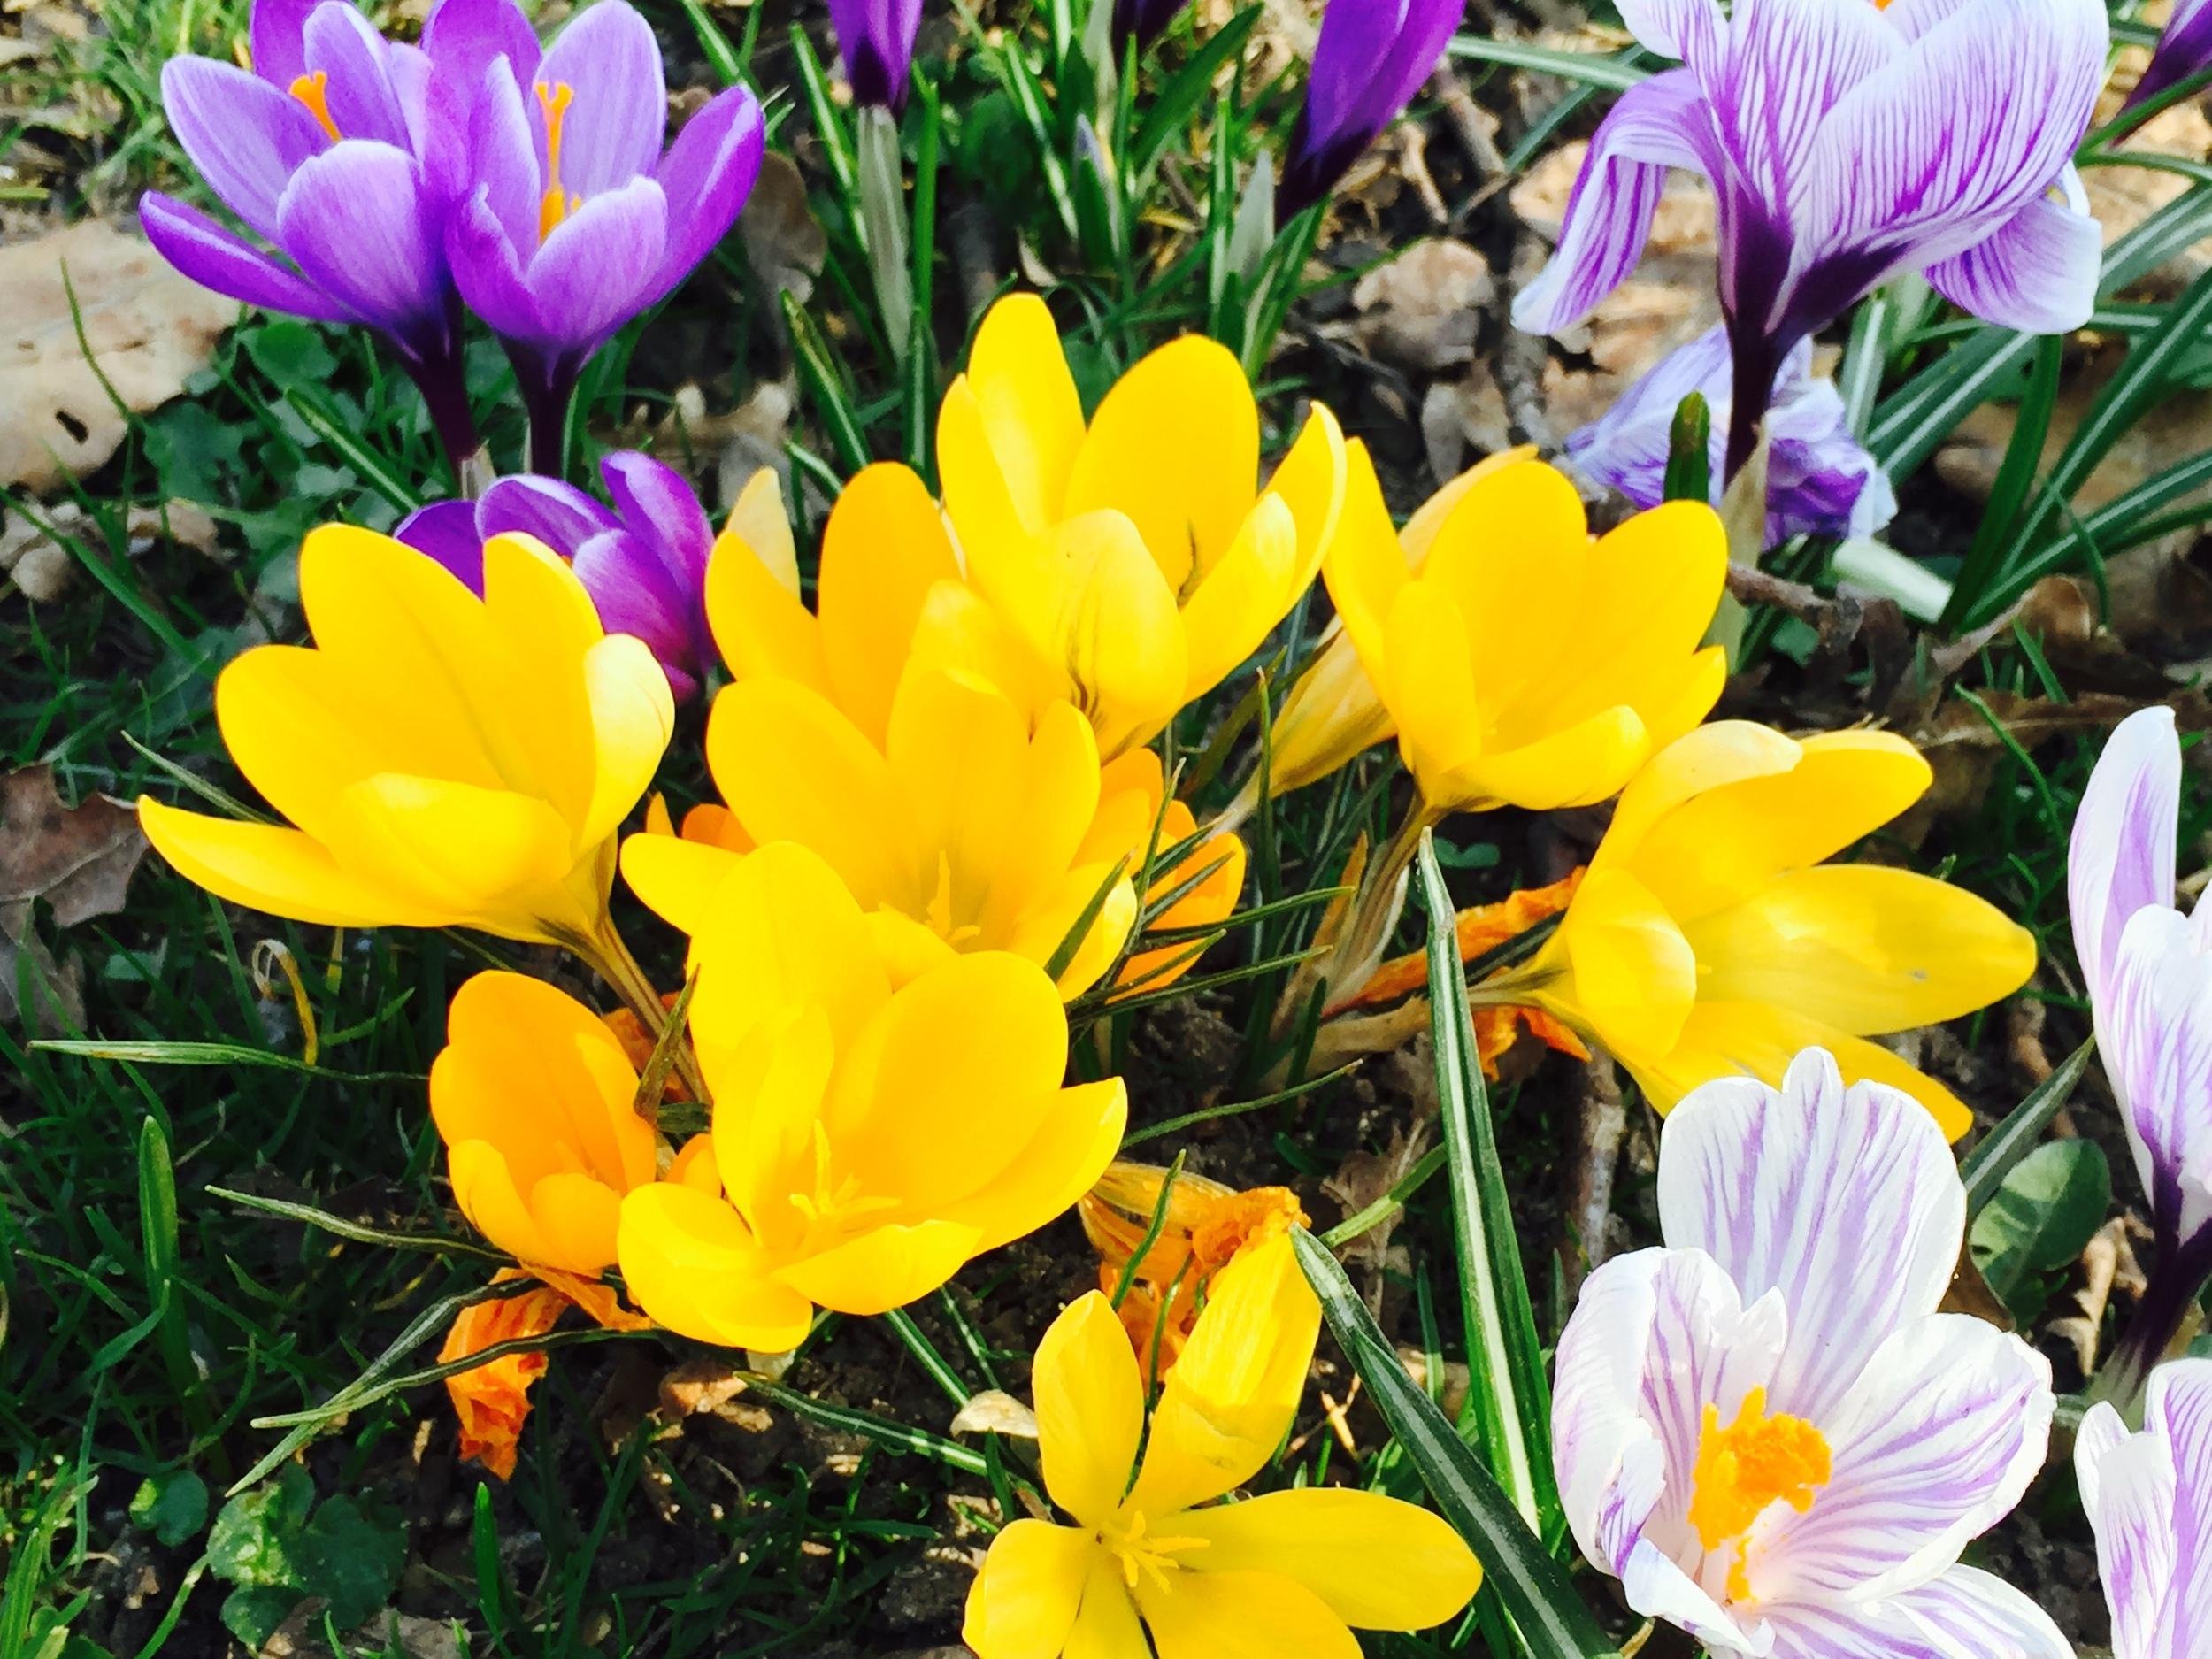 Spring_Crocuses_Free_Stock_image2